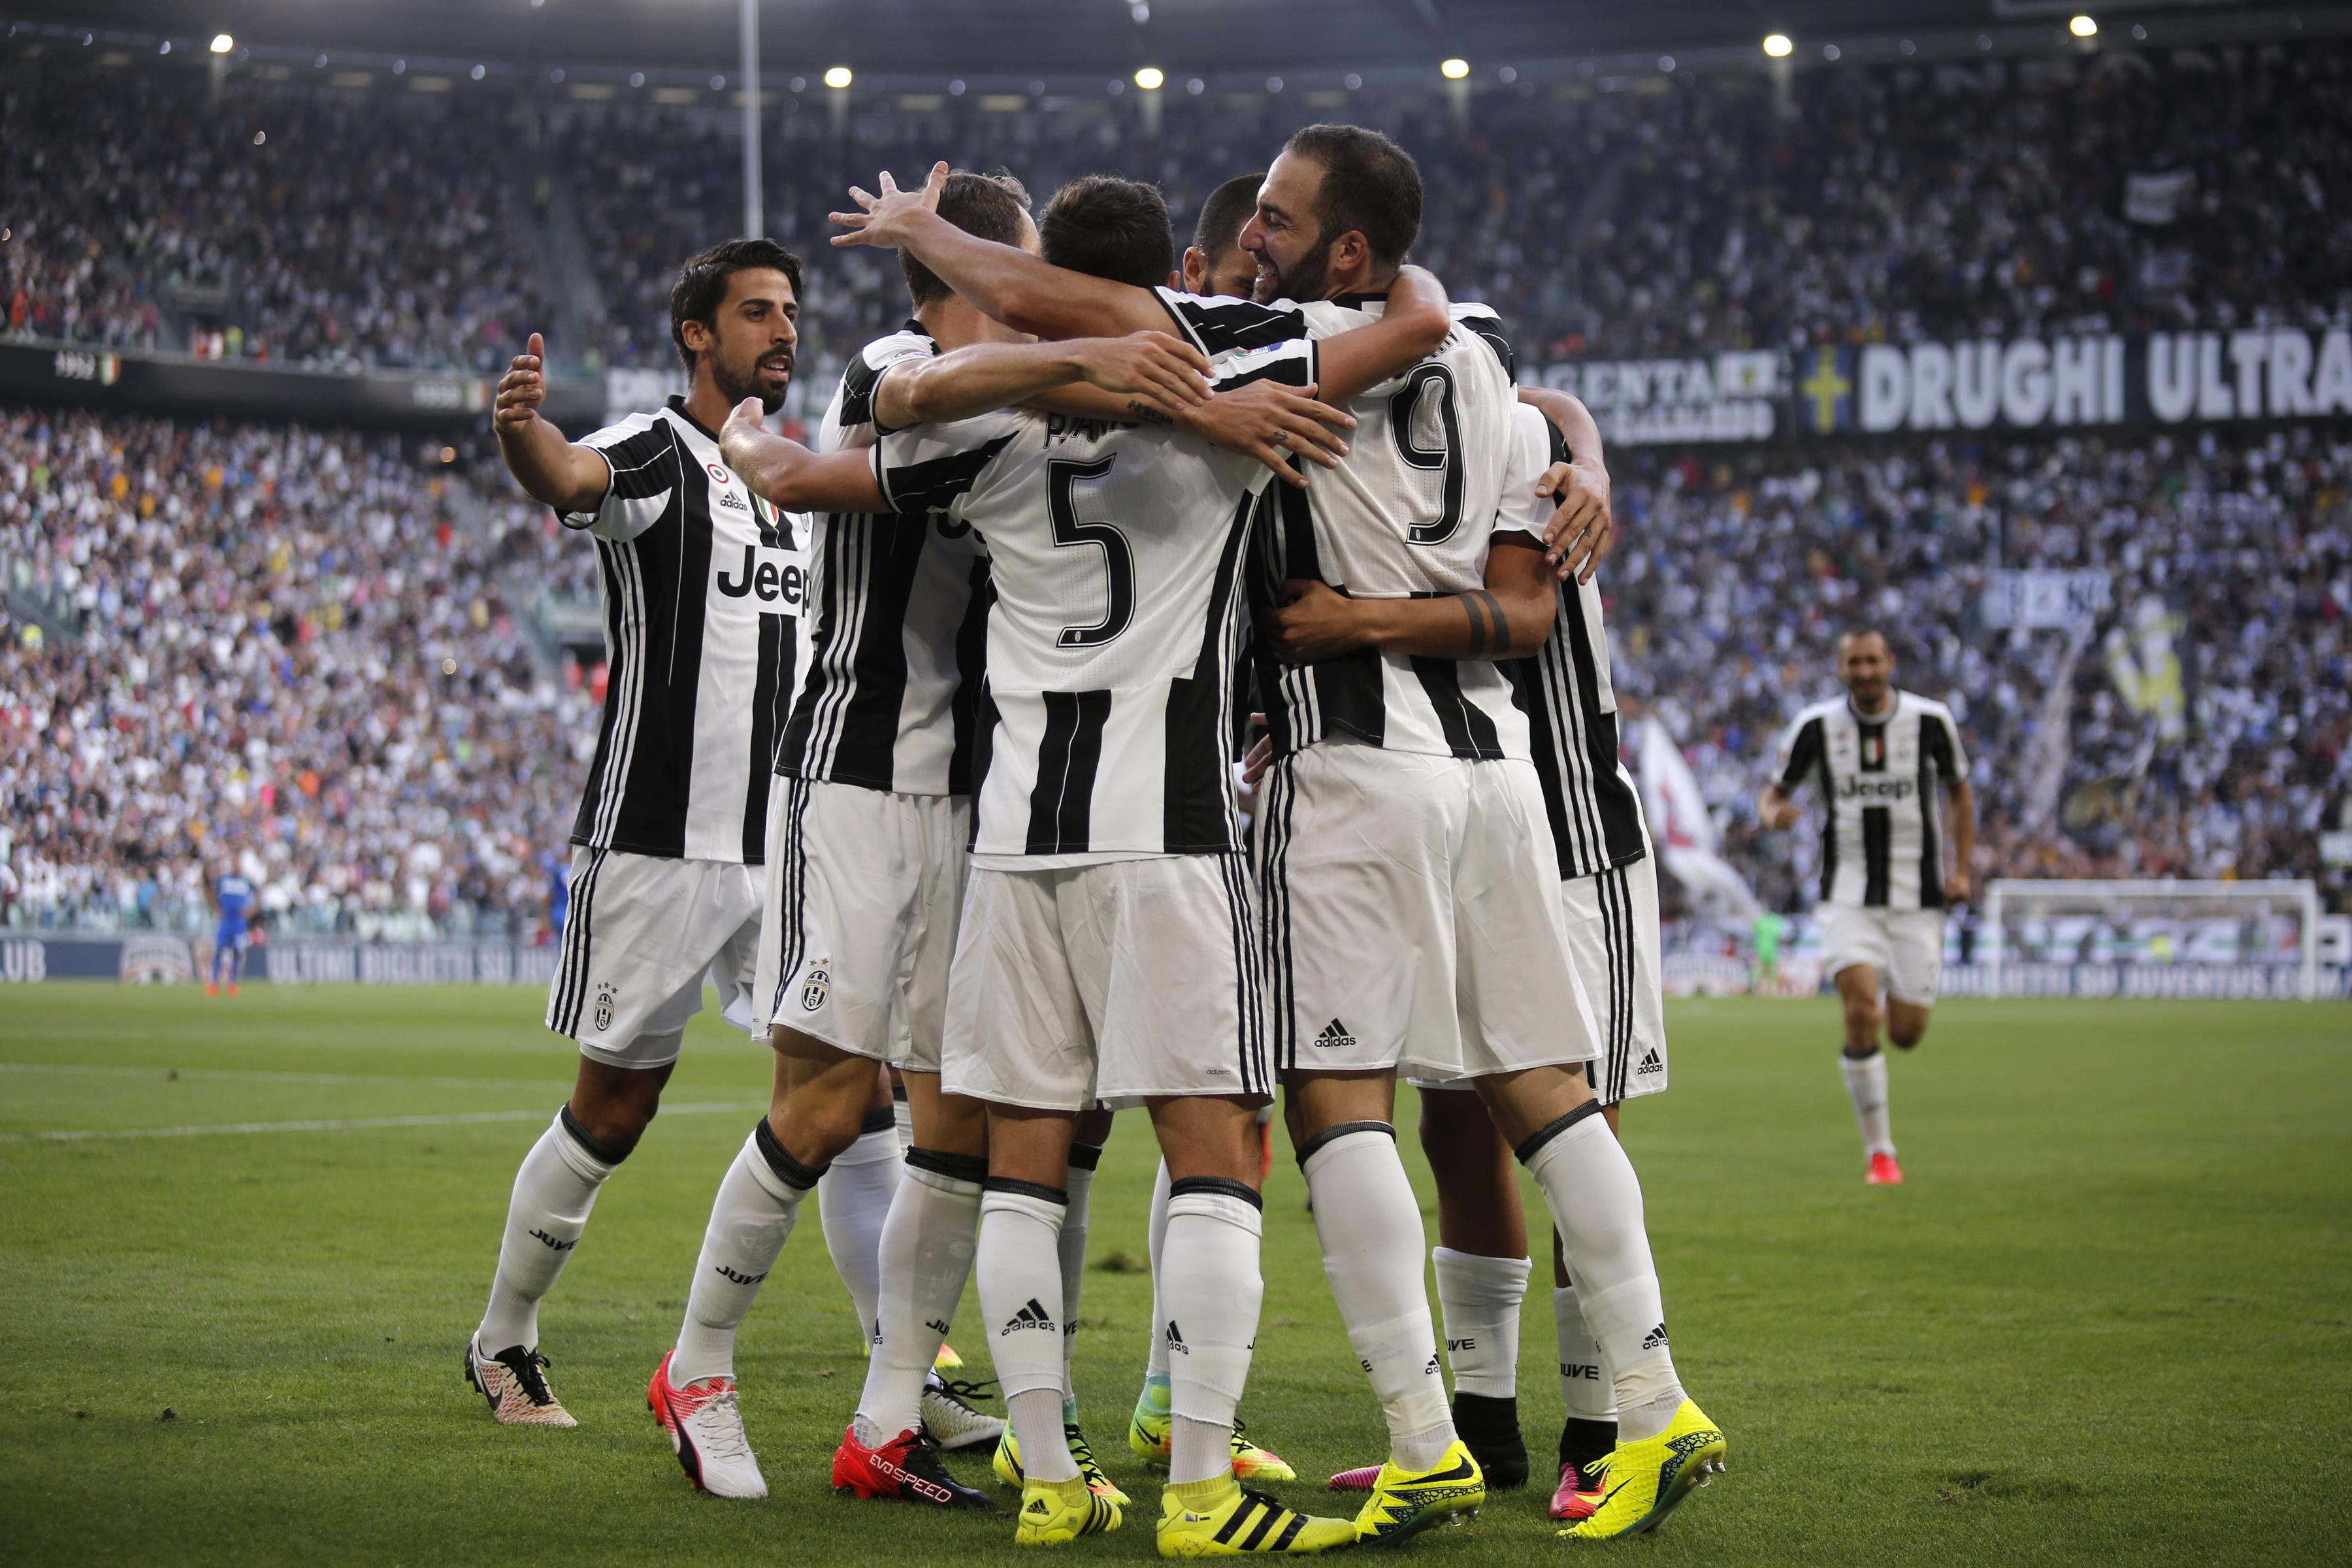 US Sassuolo Calcio v Juventus FC - Serie A - Zimbio |Sassuolo- Juventus